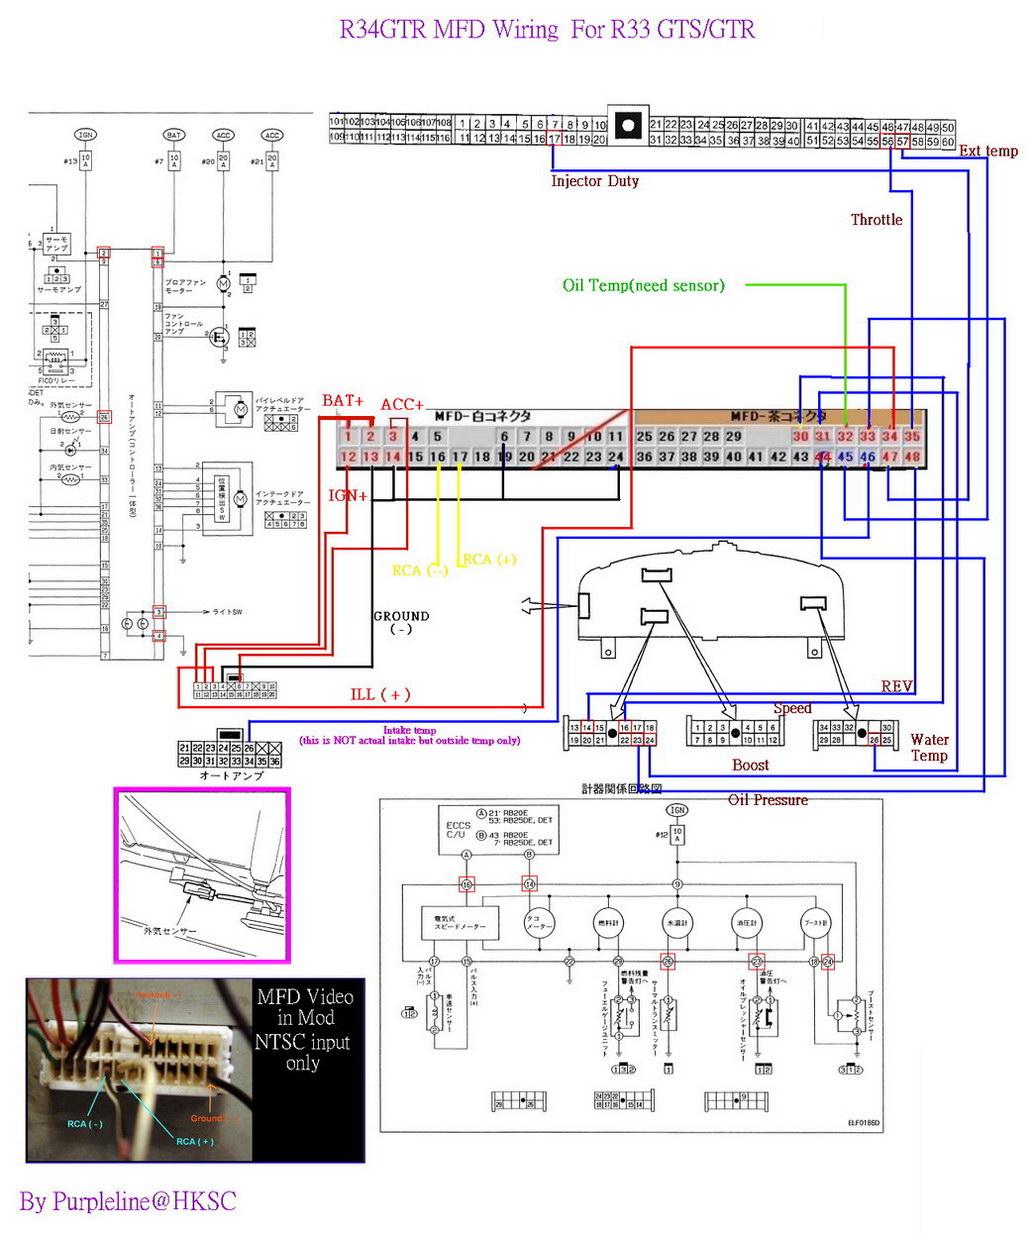 suche schaltplan kombiinstrument. Black Bedroom Furniture Sets. Home Design Ideas